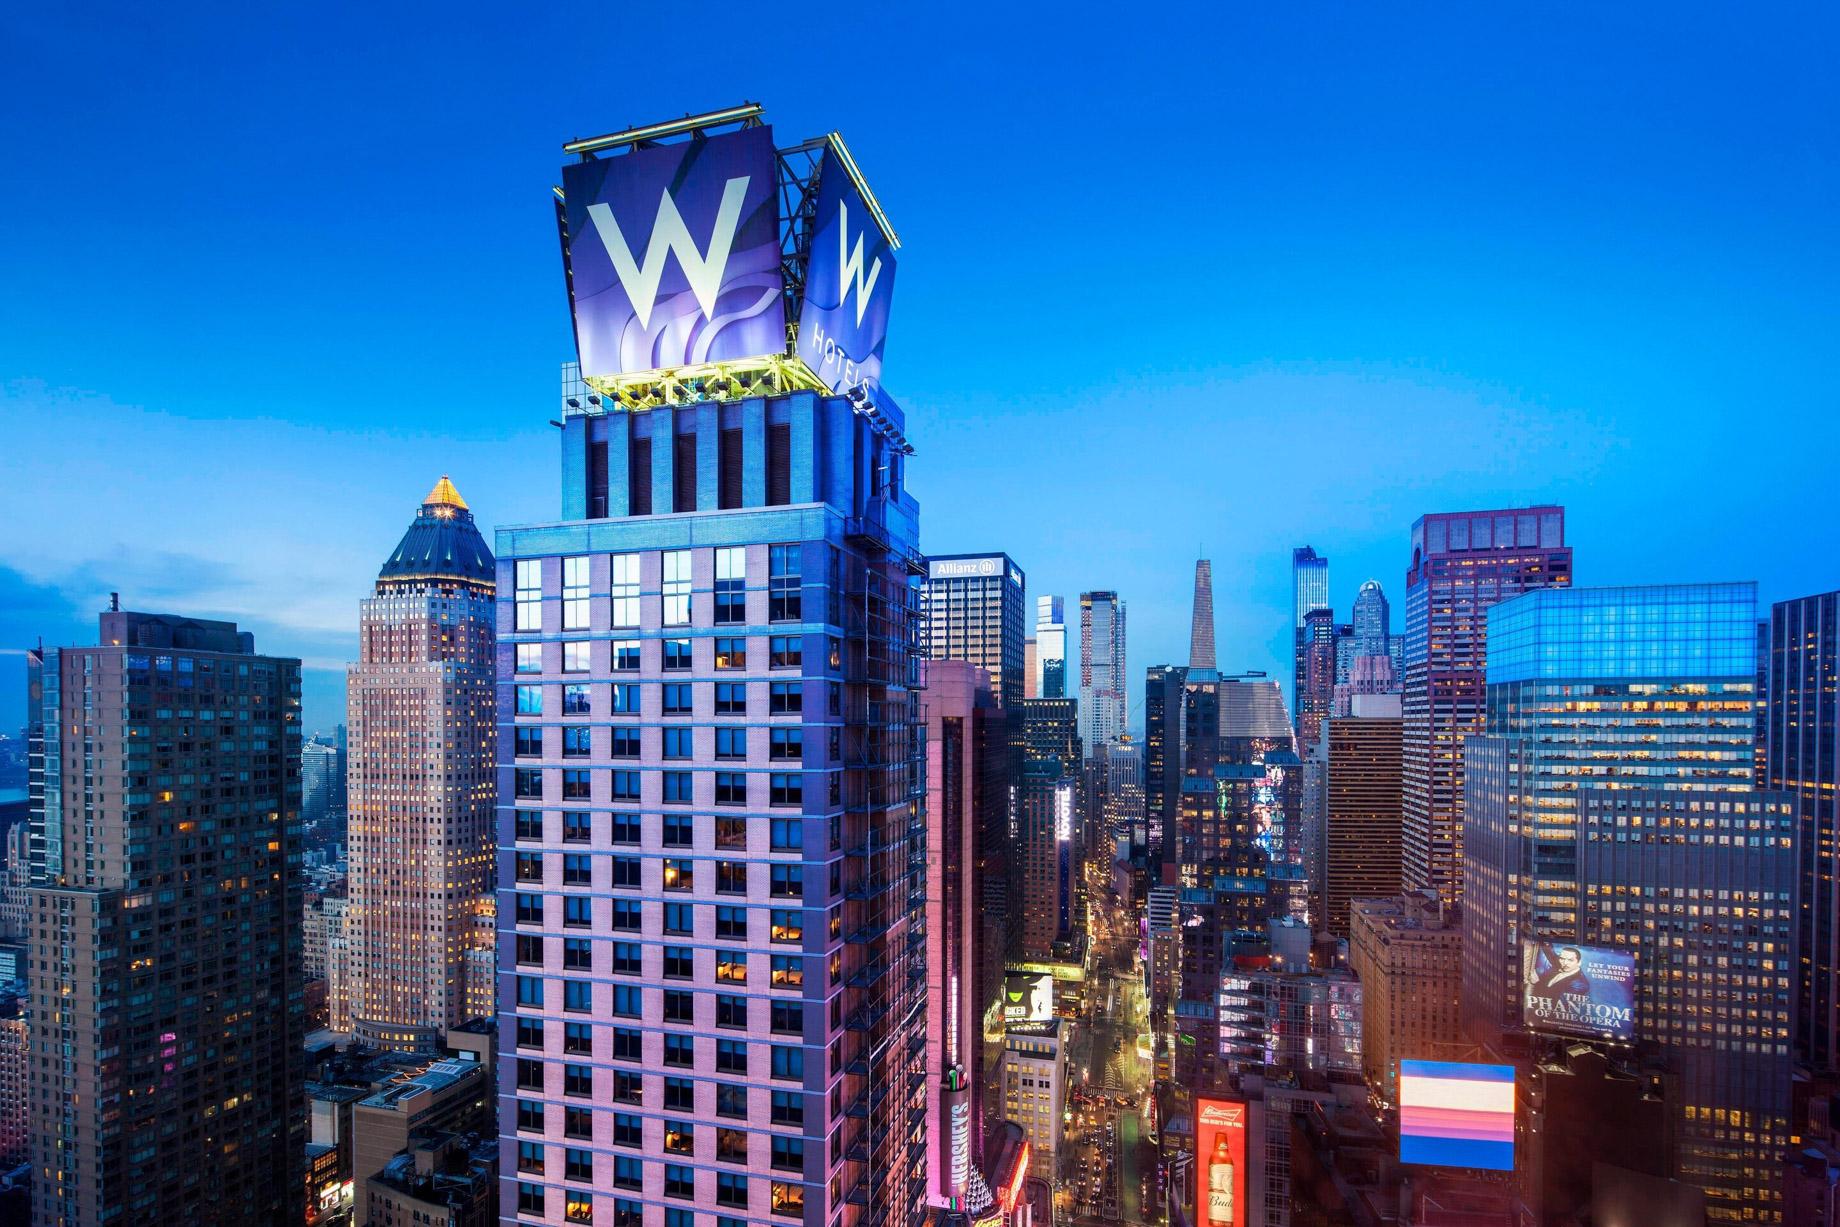 W New York Times Square Luxury Hotel - New York, NY, USA - W New York